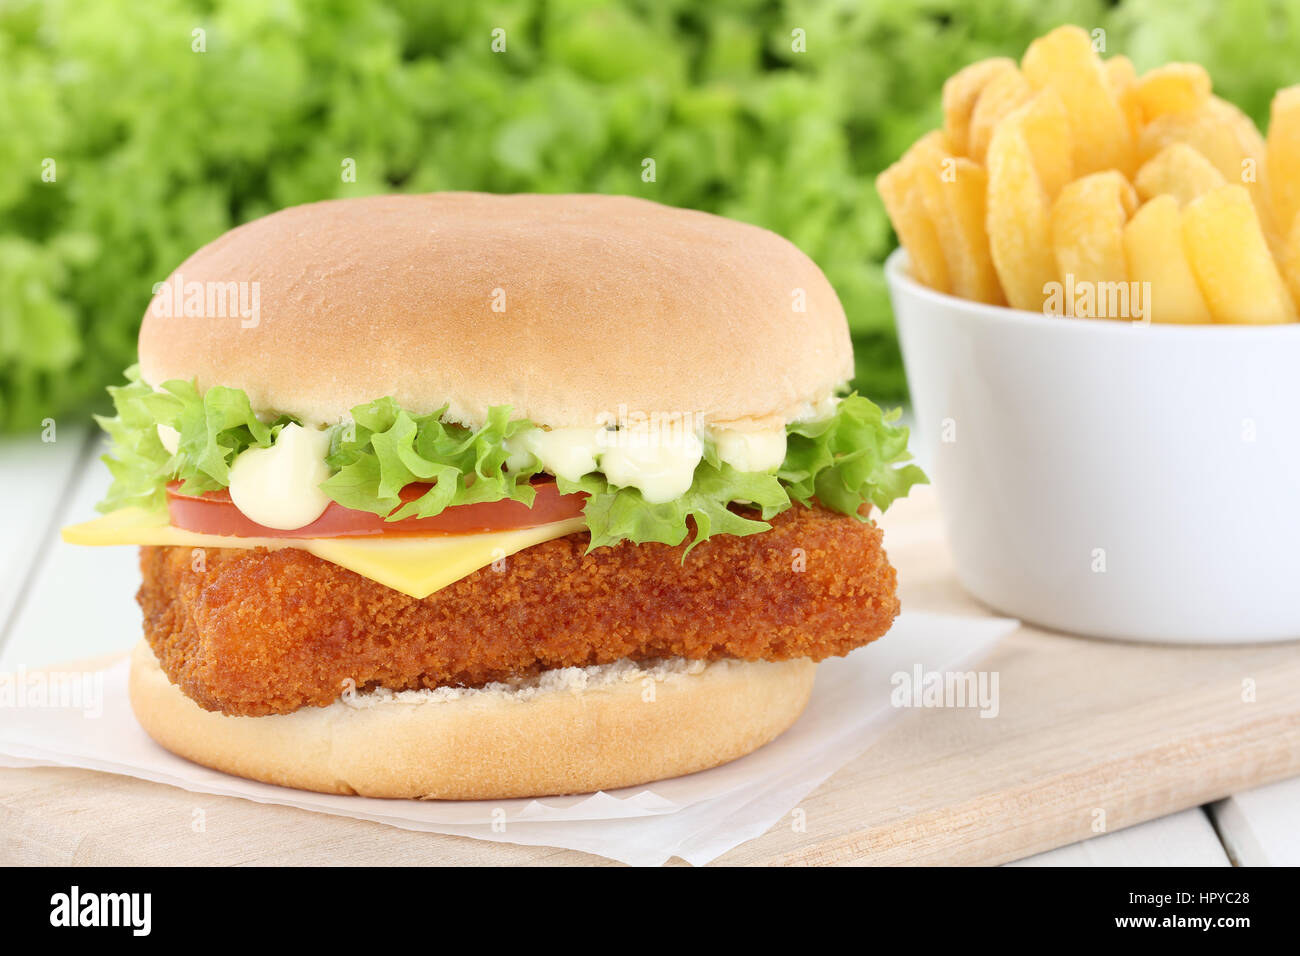 Fish burger fishburger hamburger with fries tomatoes lettuce cheese unhealthy - Stock Image